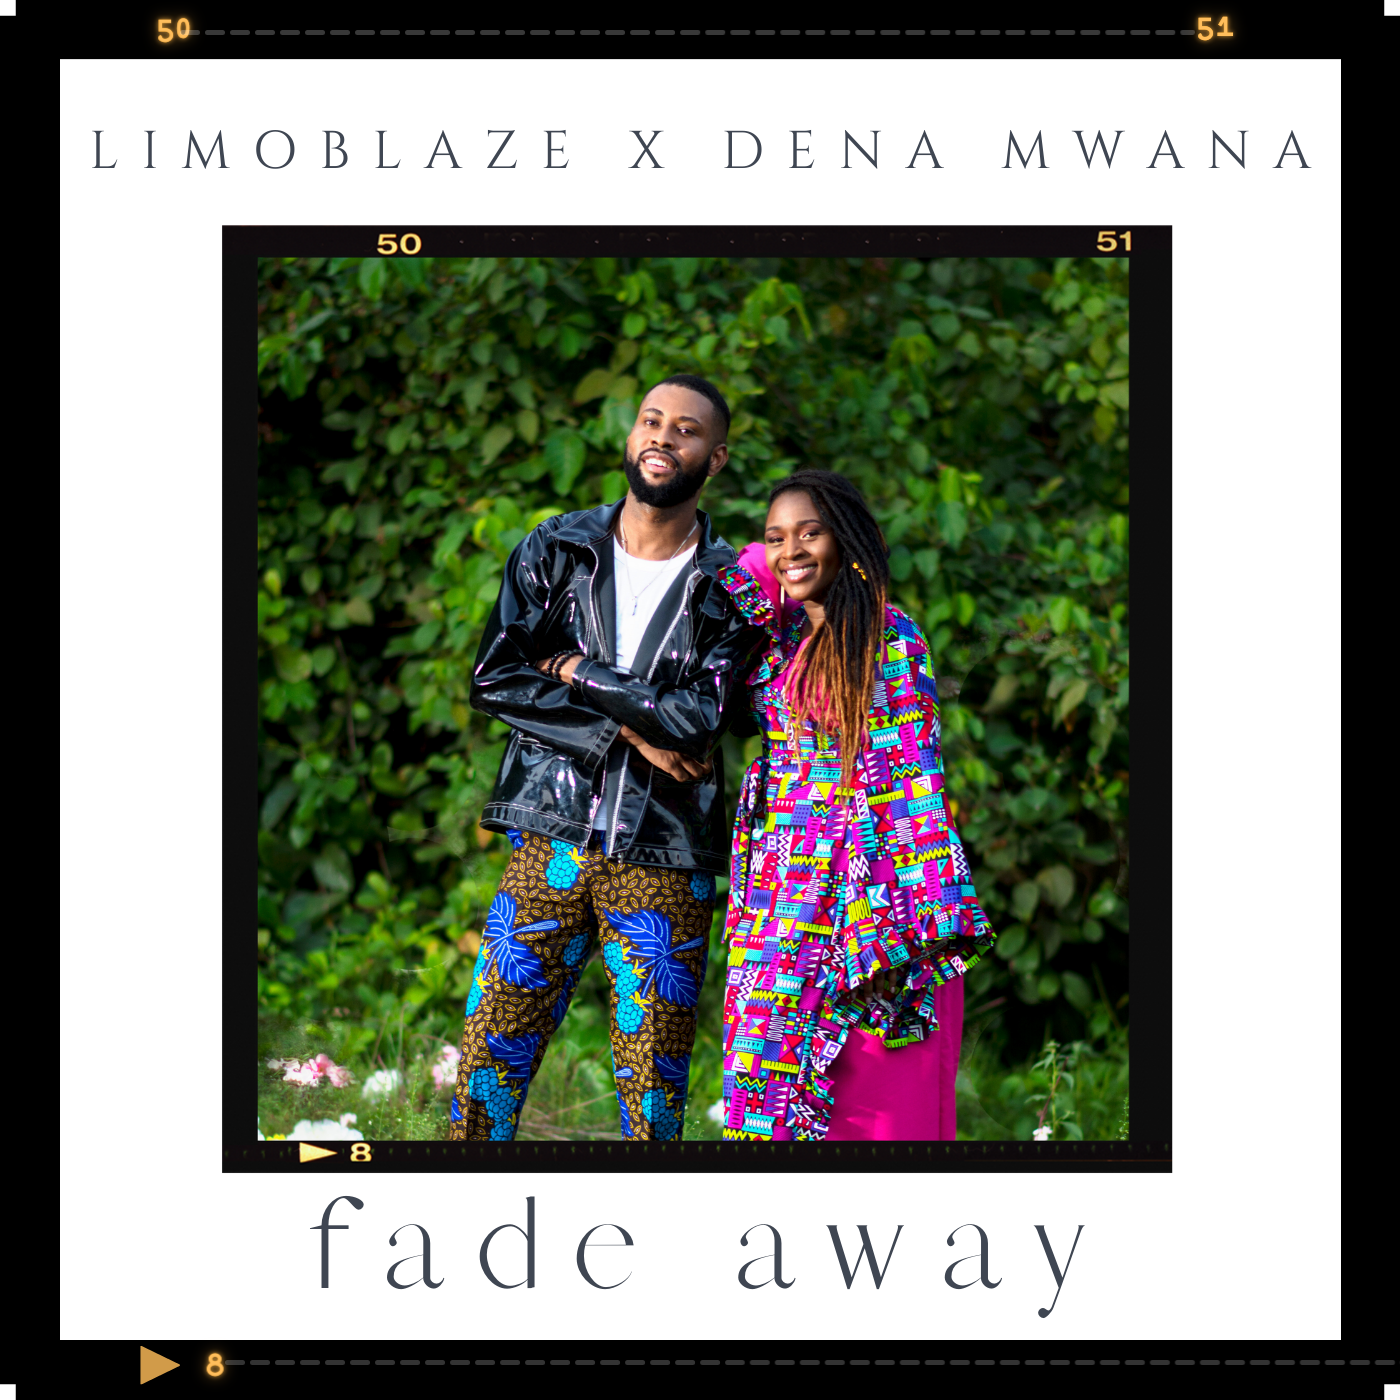 Limoblaze – Fade Away Ft. Dena Mwana mp3 download